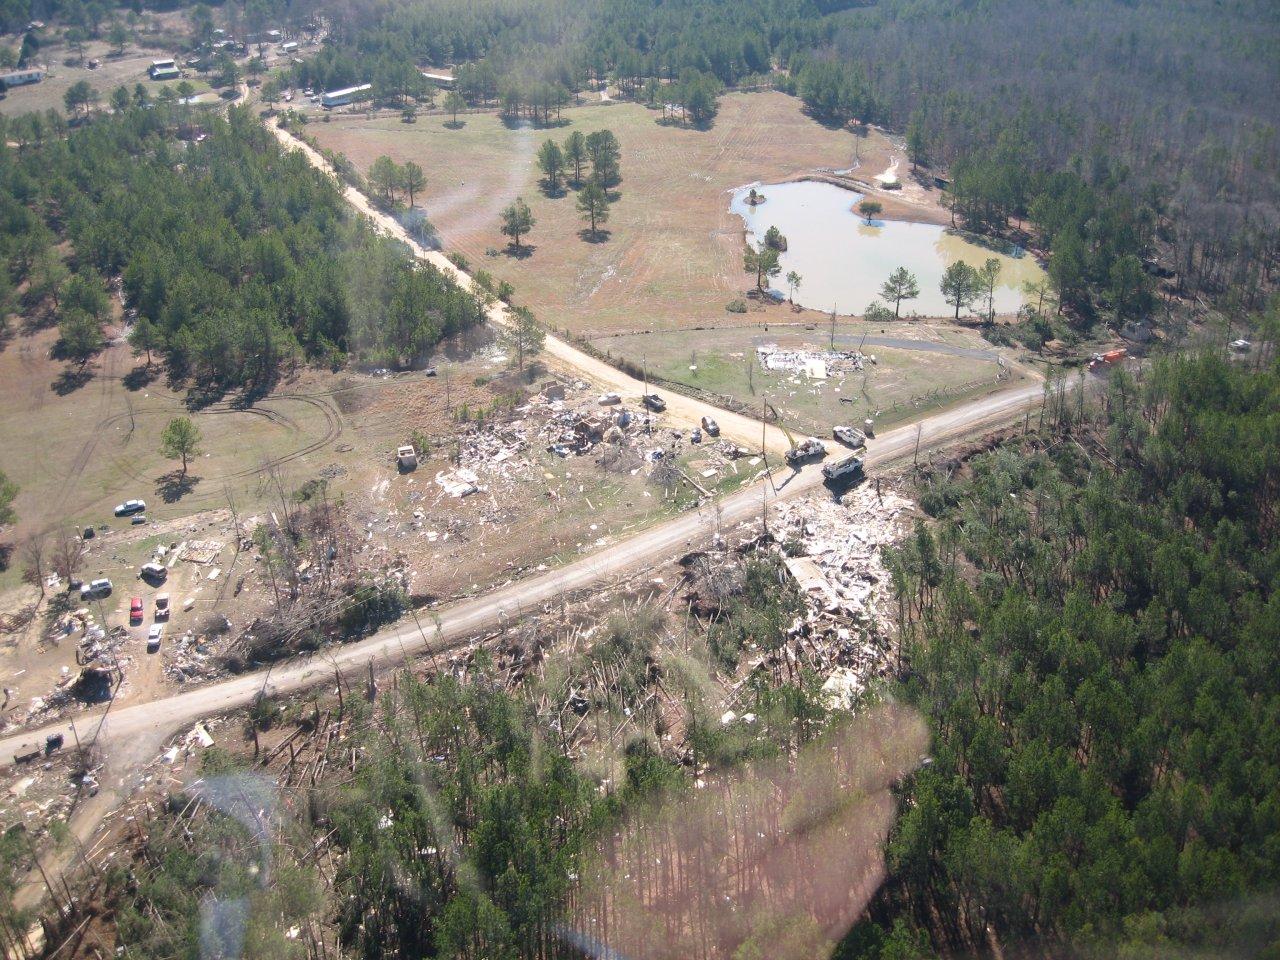 Jackson County, AL EF4 Tornado – February 6, 2008